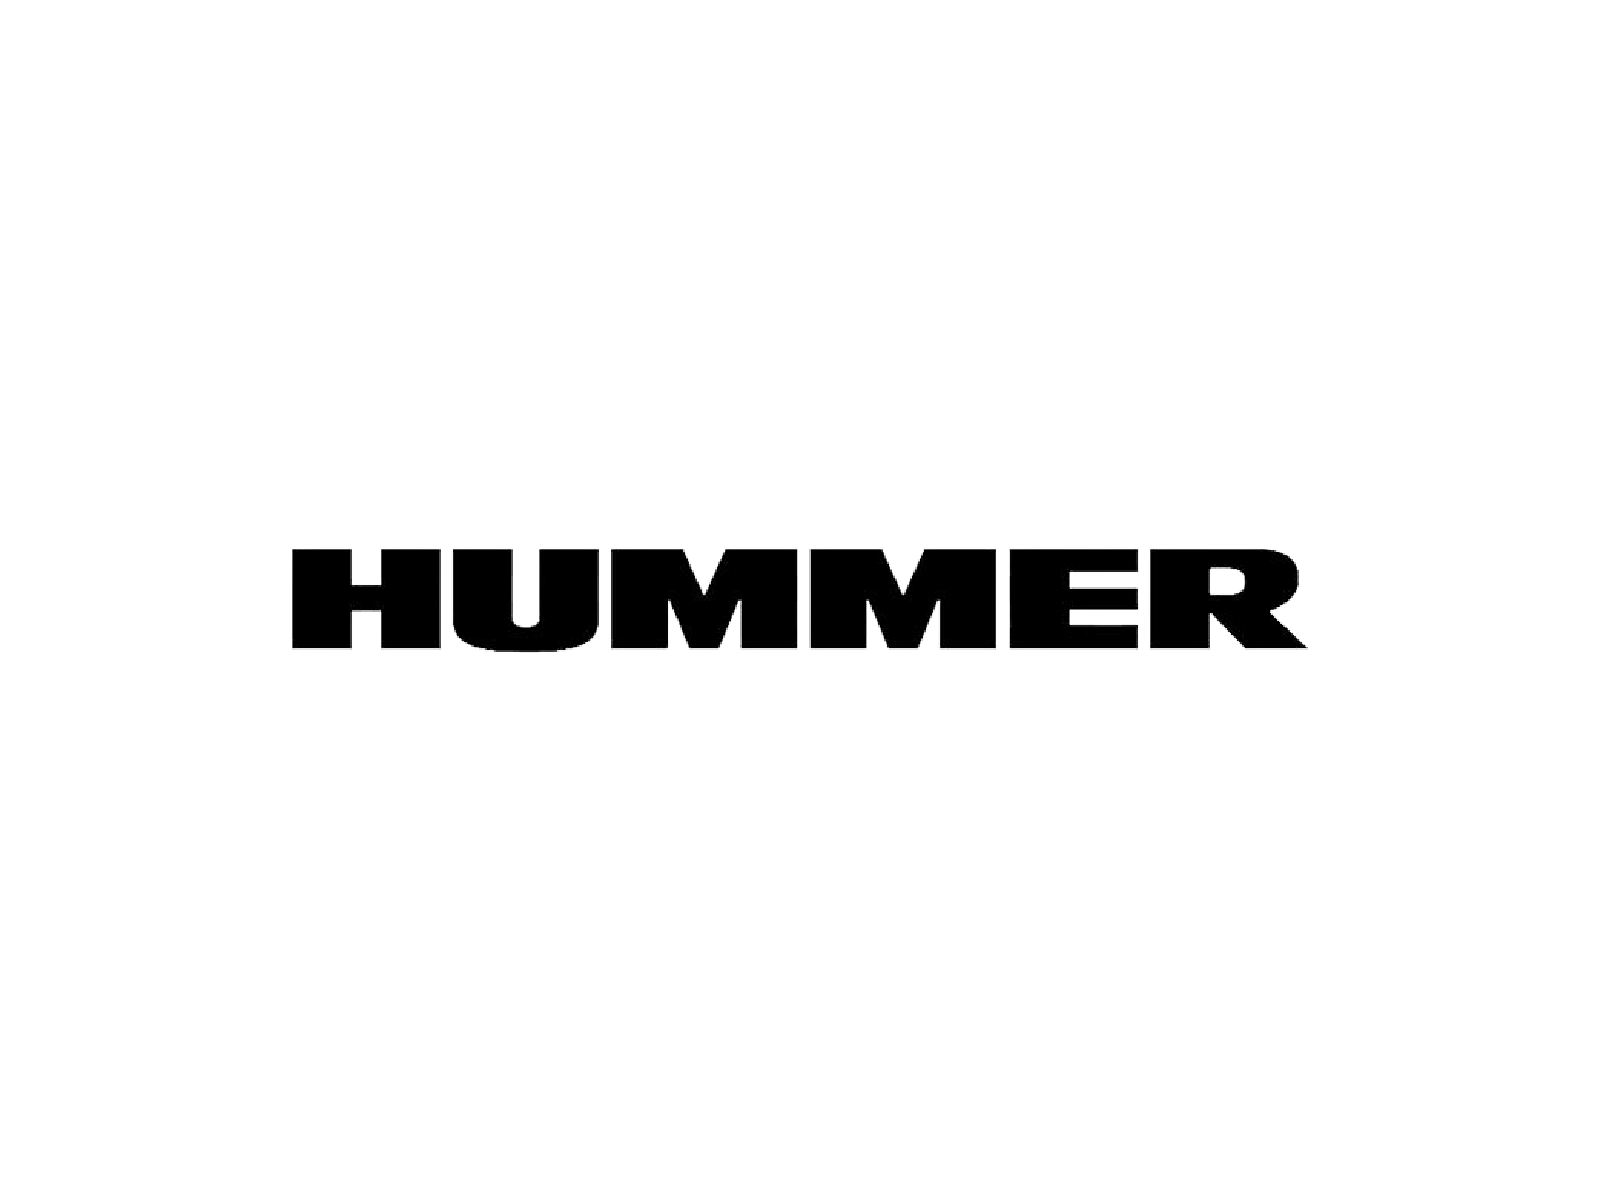 Hunmer